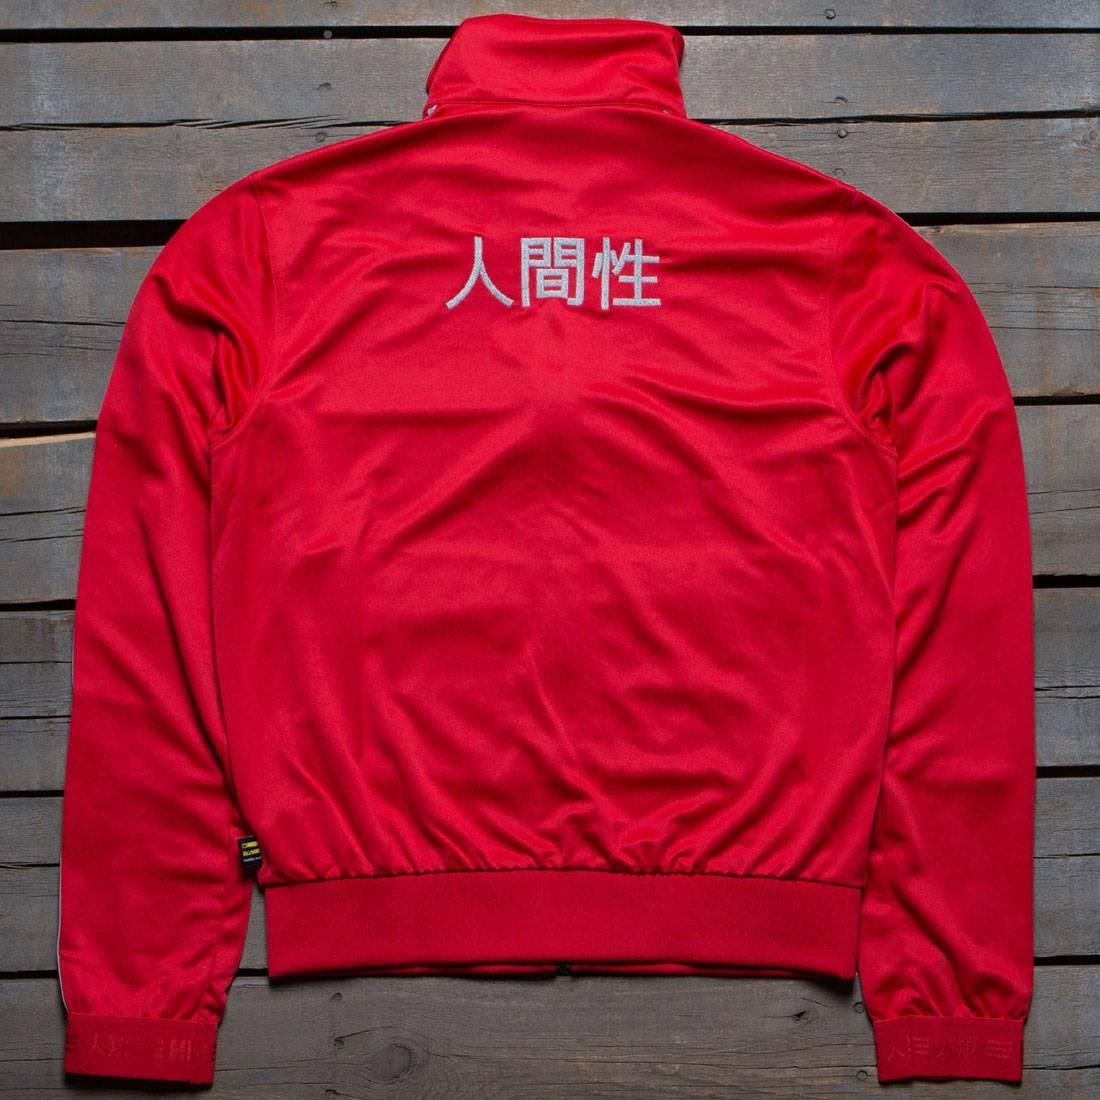 Adidas x Pharrell Williams Men Hu Race Track Jacket red scarlet